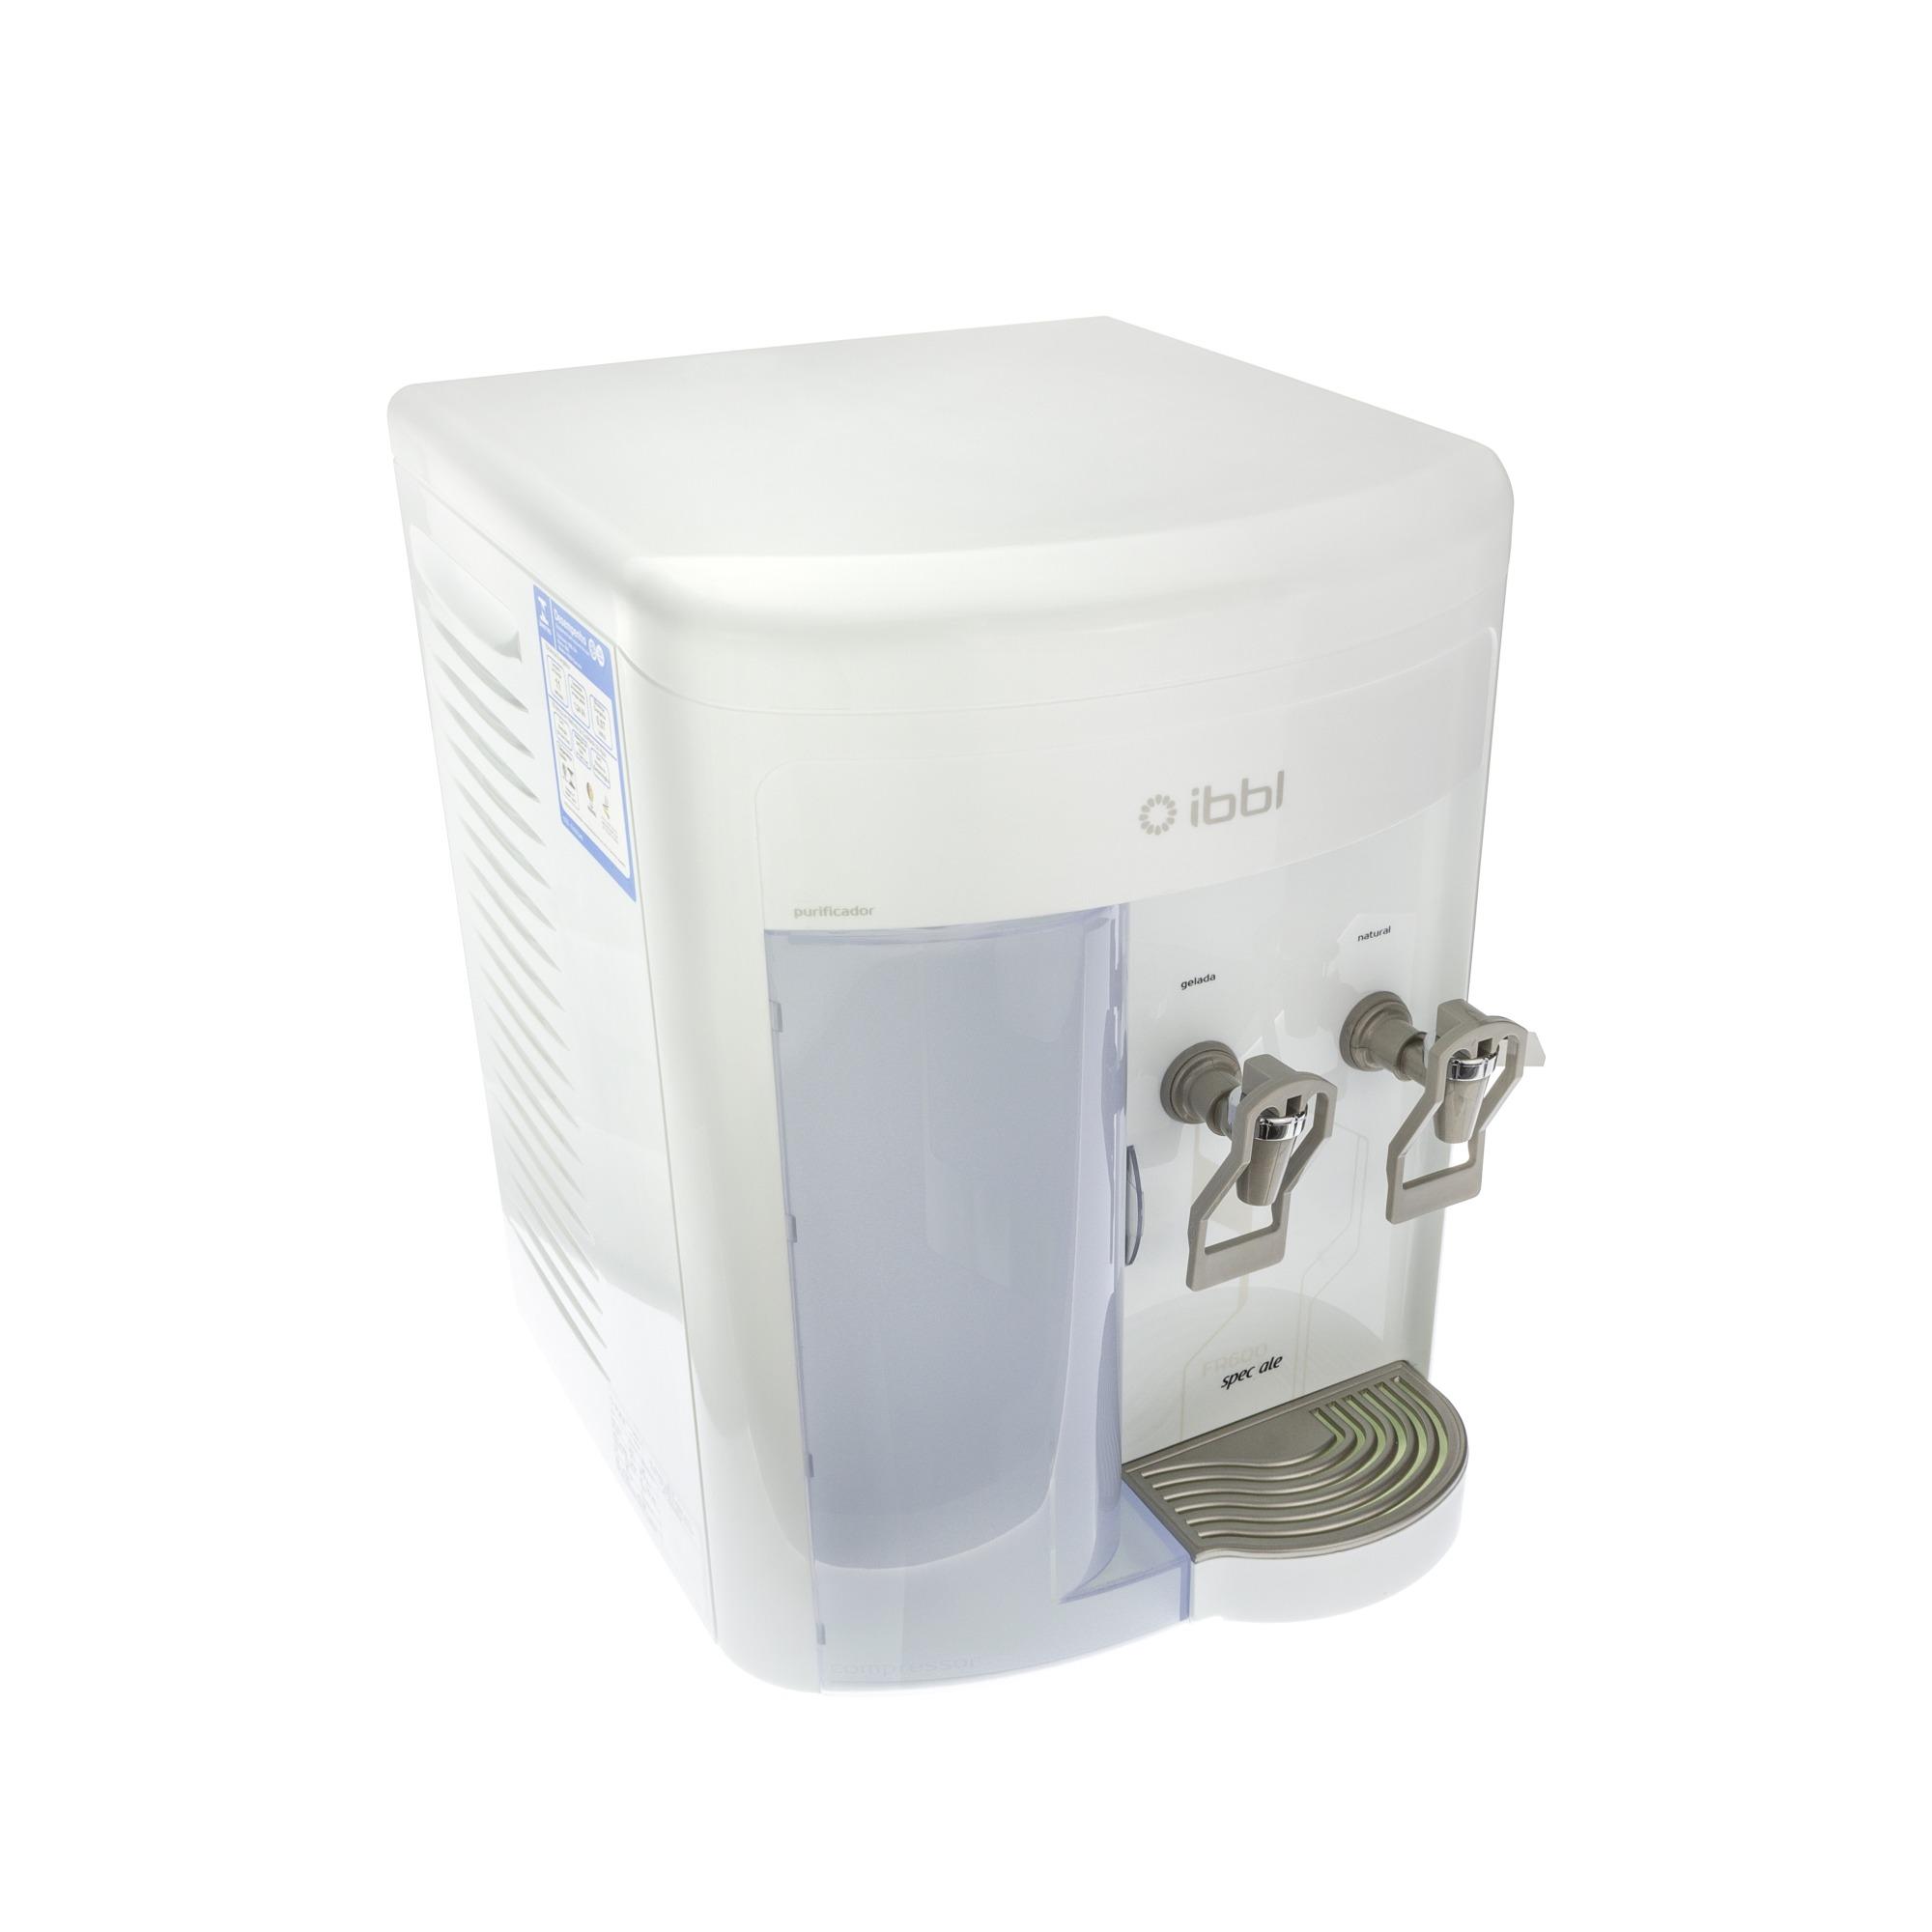 Purificador de Agua Gabinete Branco Speciale FR600 220V - Ibbl